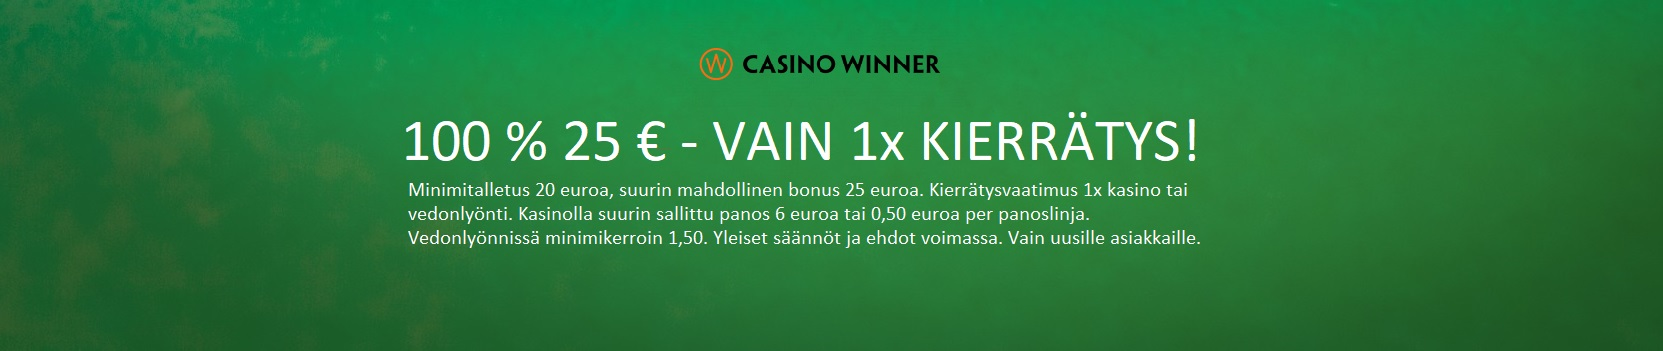 casinowinner_slider